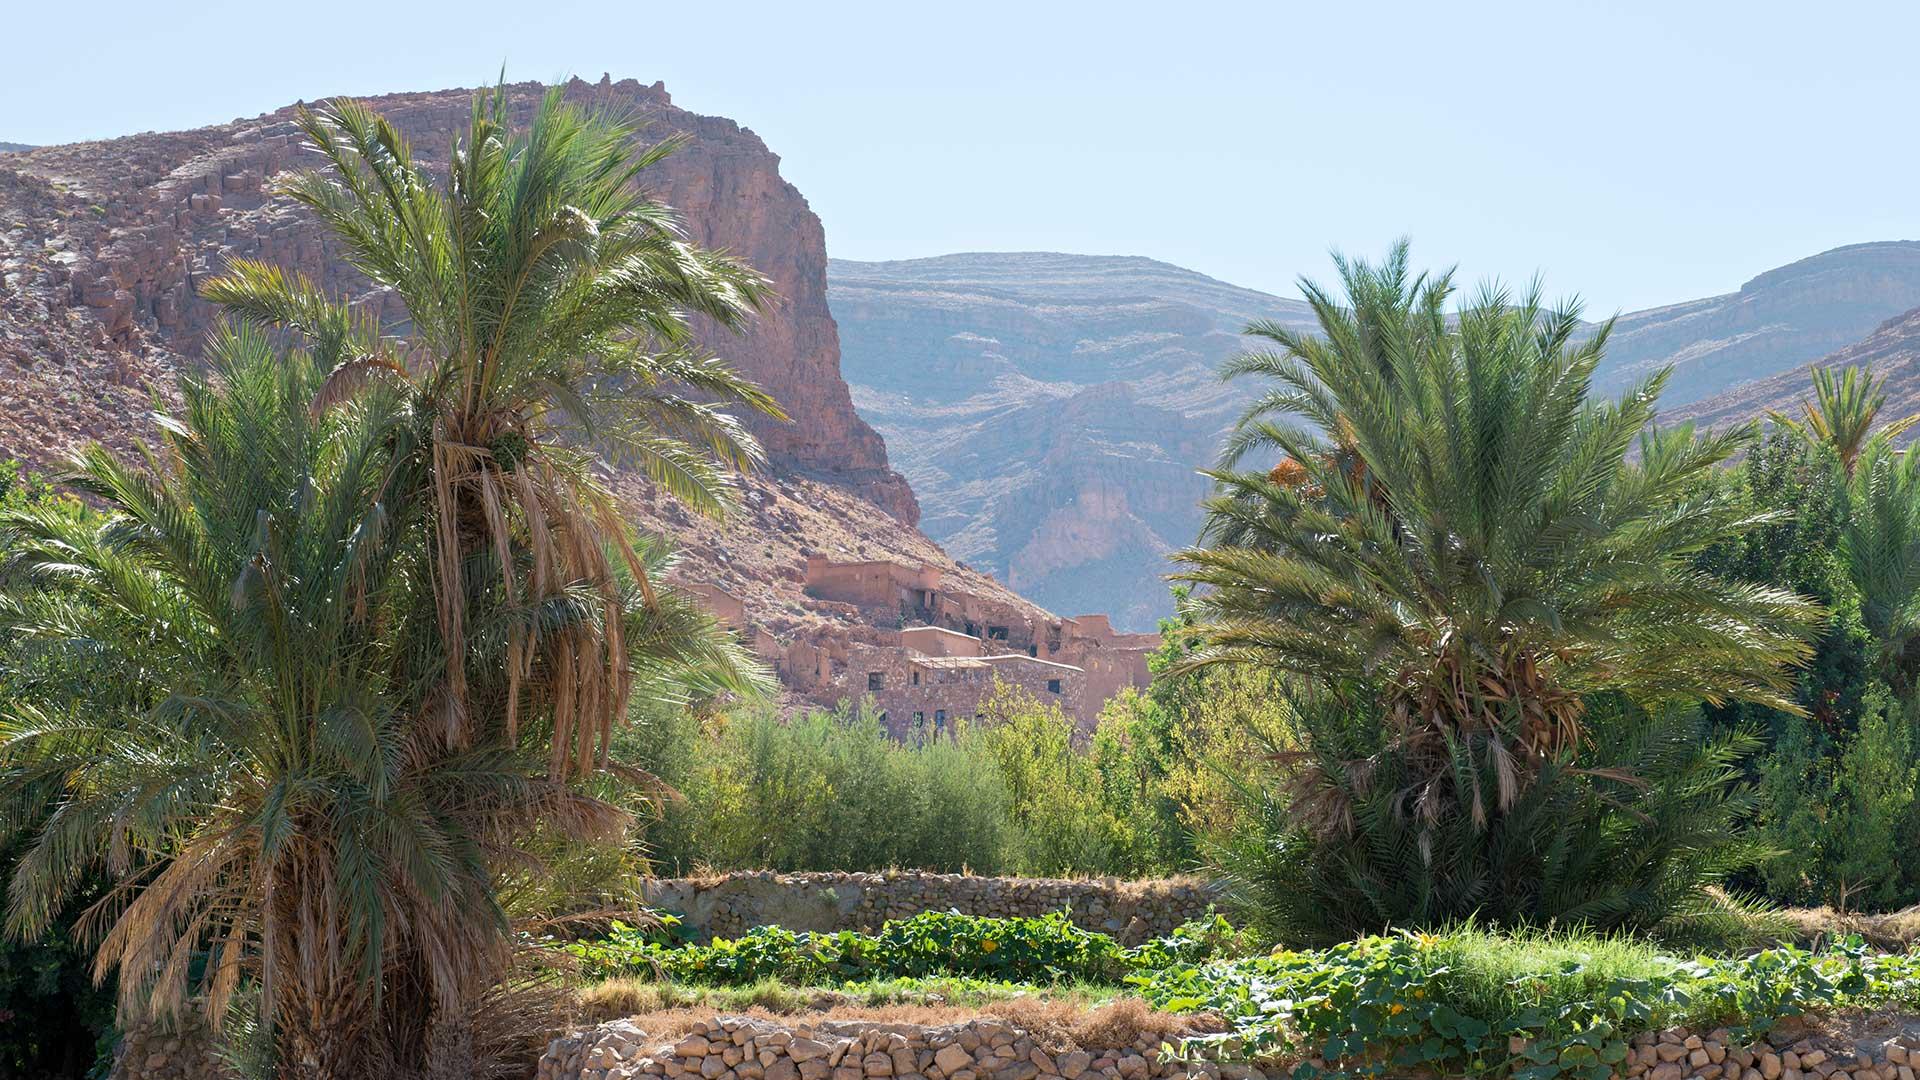 Riad La Maison Rouge scenery